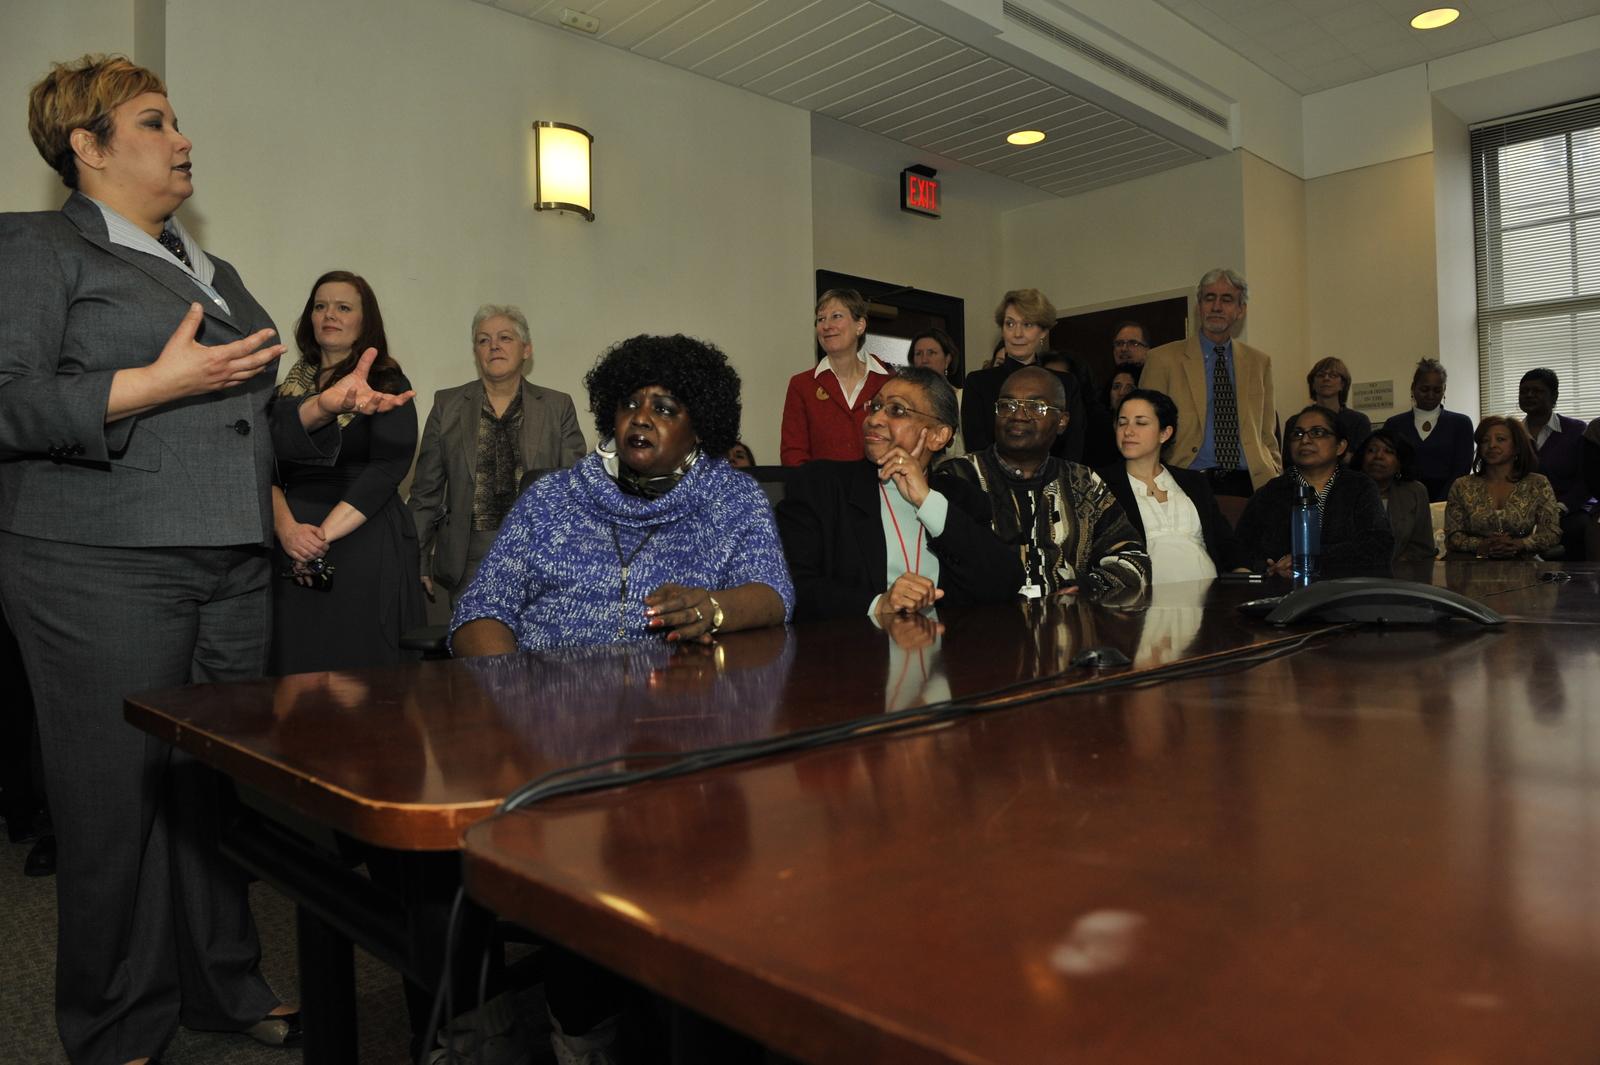 Office of the Administrator - Lisa Jackson's Farewell Tour [412-APD-1115-2013-02-07_FarewellTour_161.JPG]